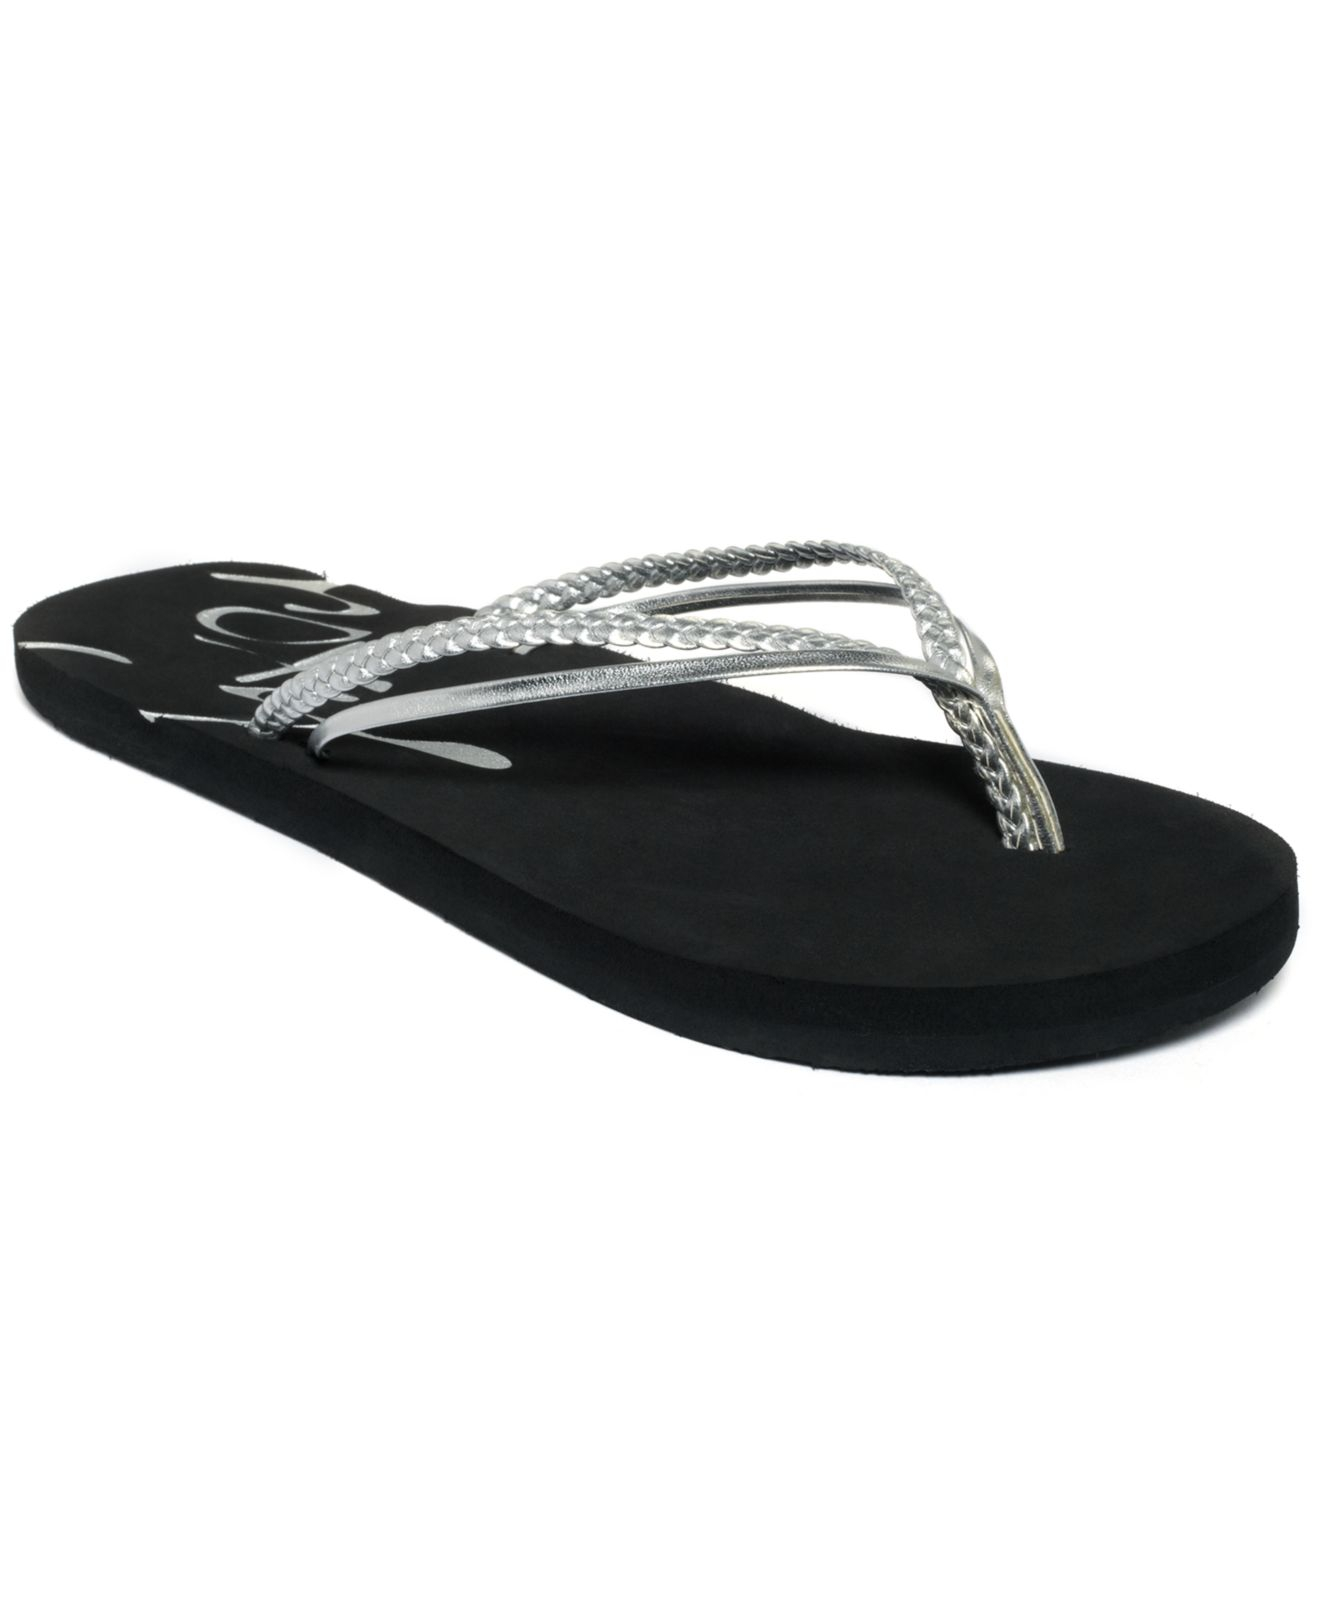 Black roxy sandals - Black Roxy Sandals Gallery